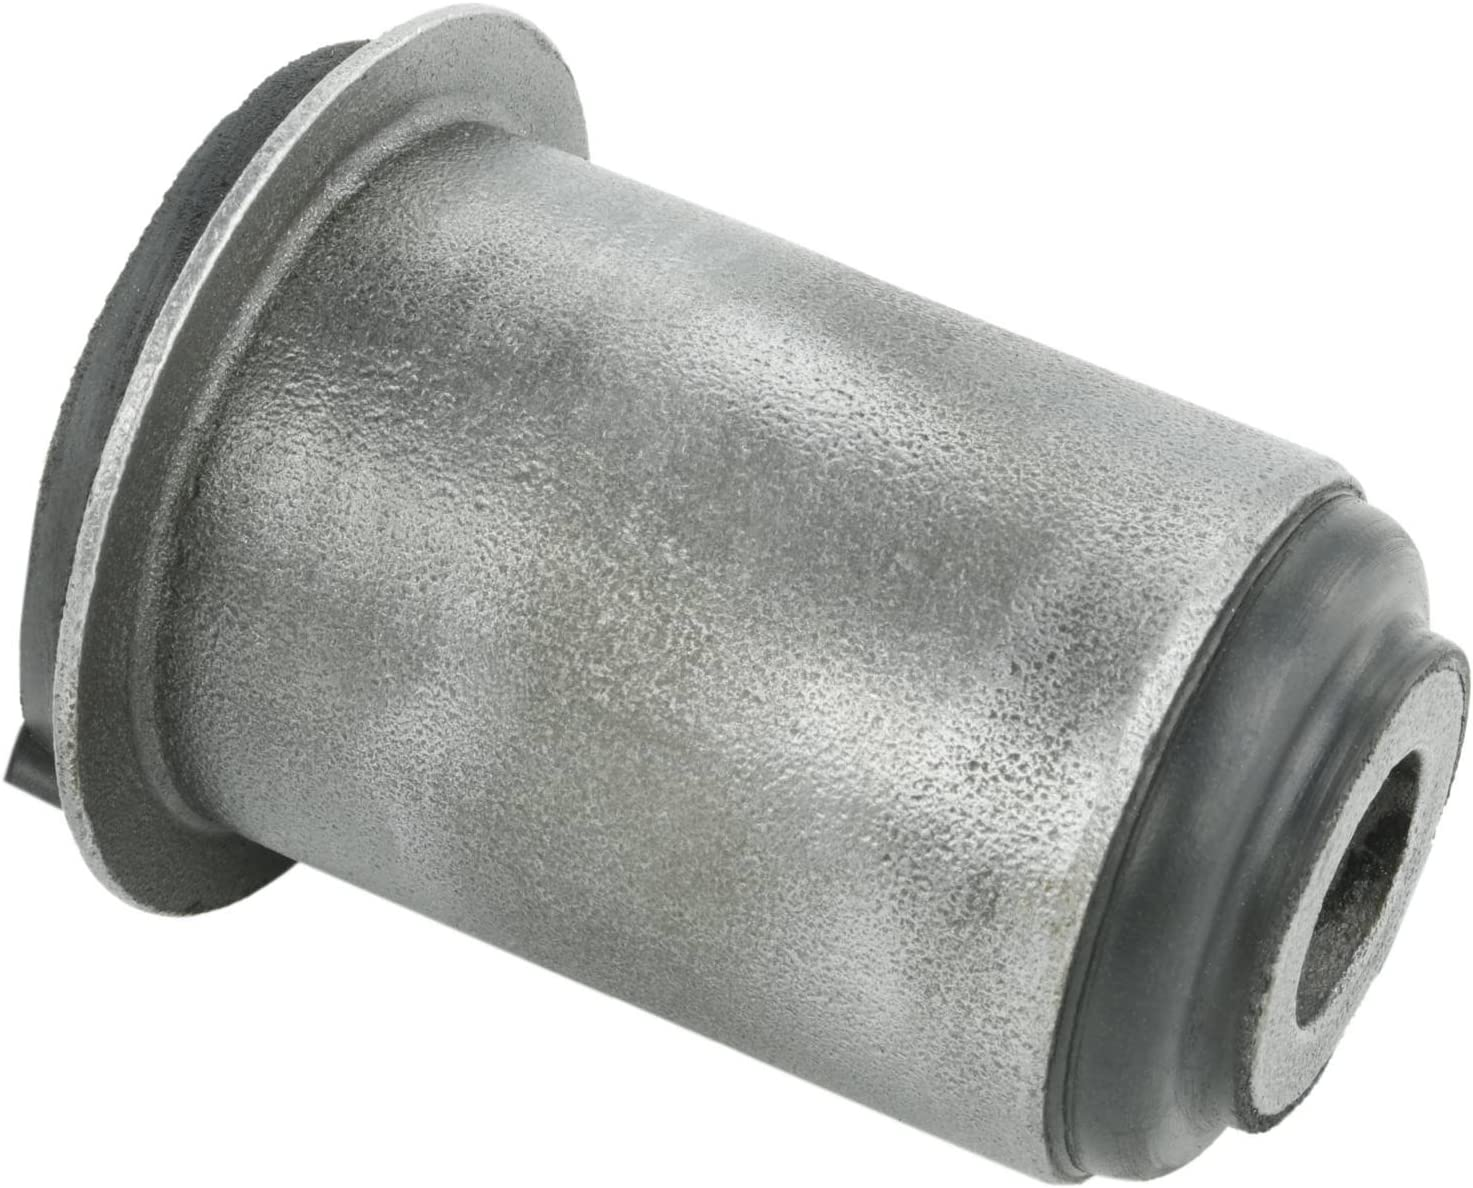 Rear Knuckle Lower Bushing Febest FDAB-080 Oem 6L2Z-5A638-EB